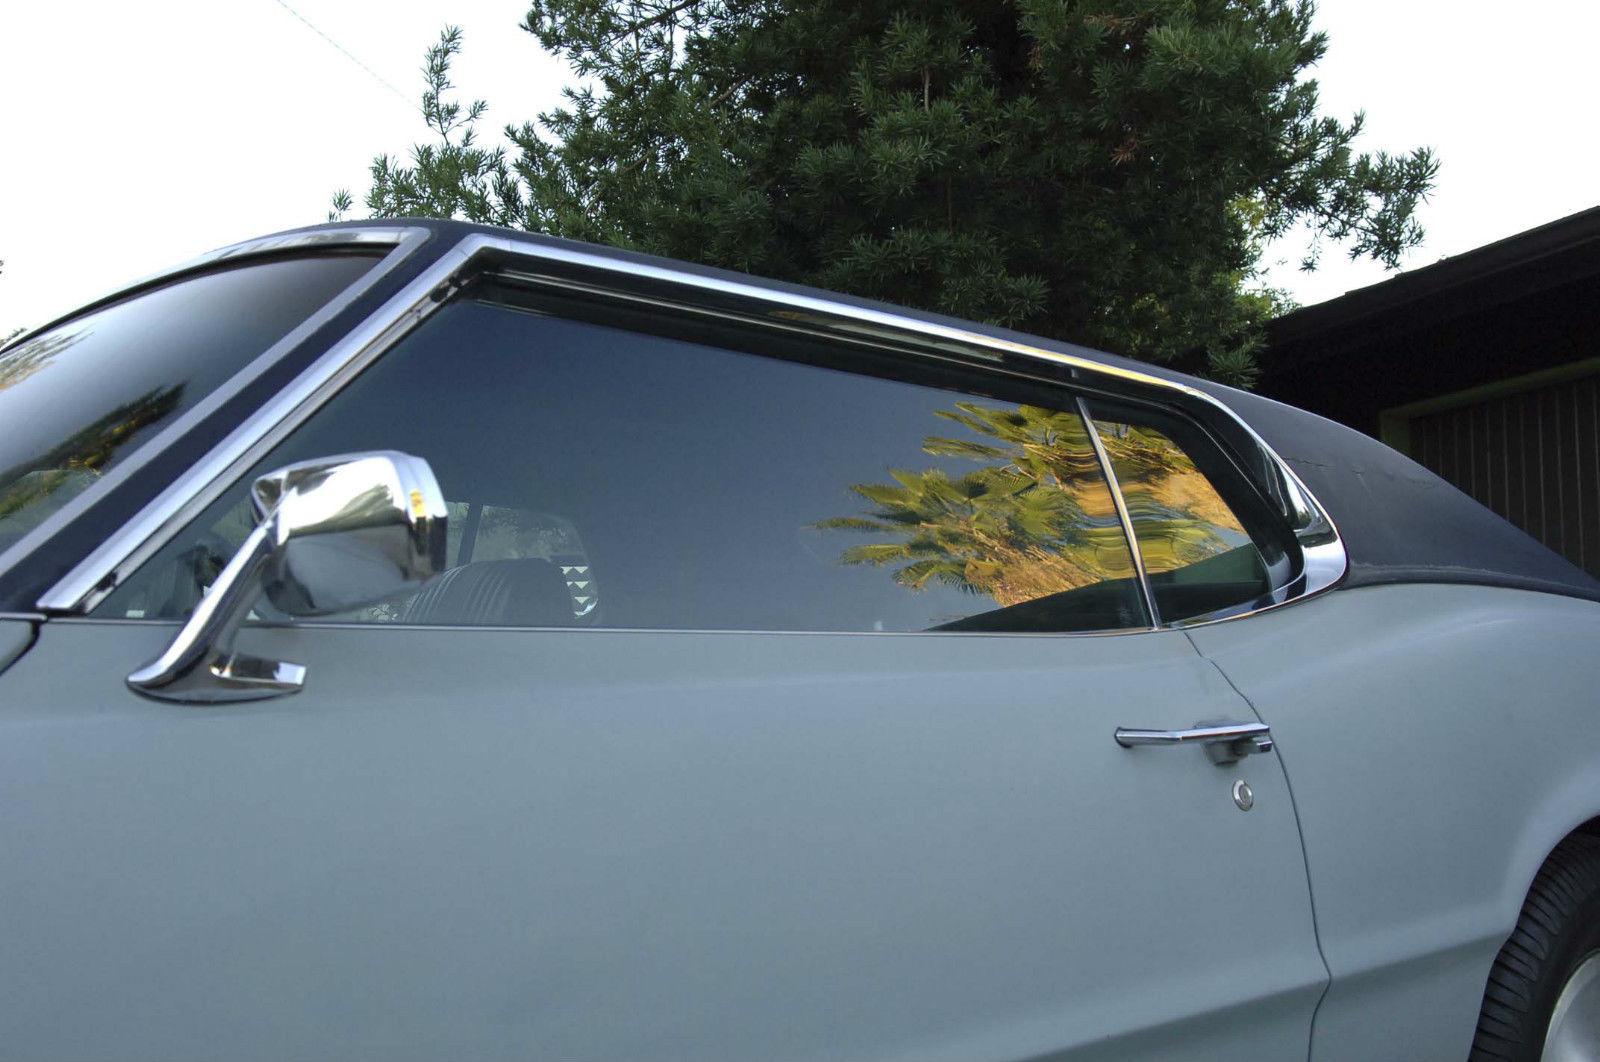 1970 Ford Thunderbird Base Landau Roof 2 Door 7 0l Coupe